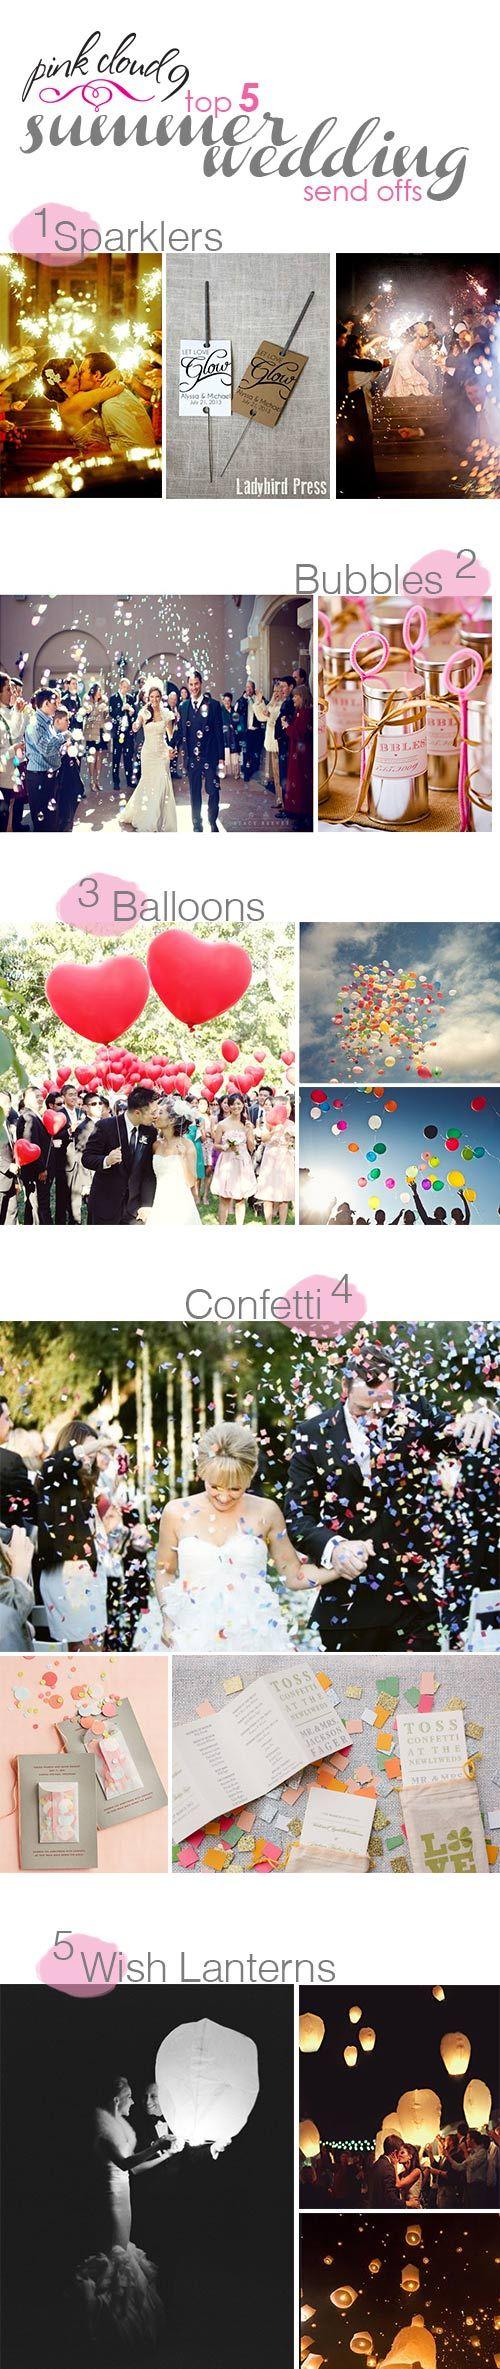 wedding send offs wedding send off ideas summer wedding send offs PINK CLOUD 9 use www customweddingprintables com for